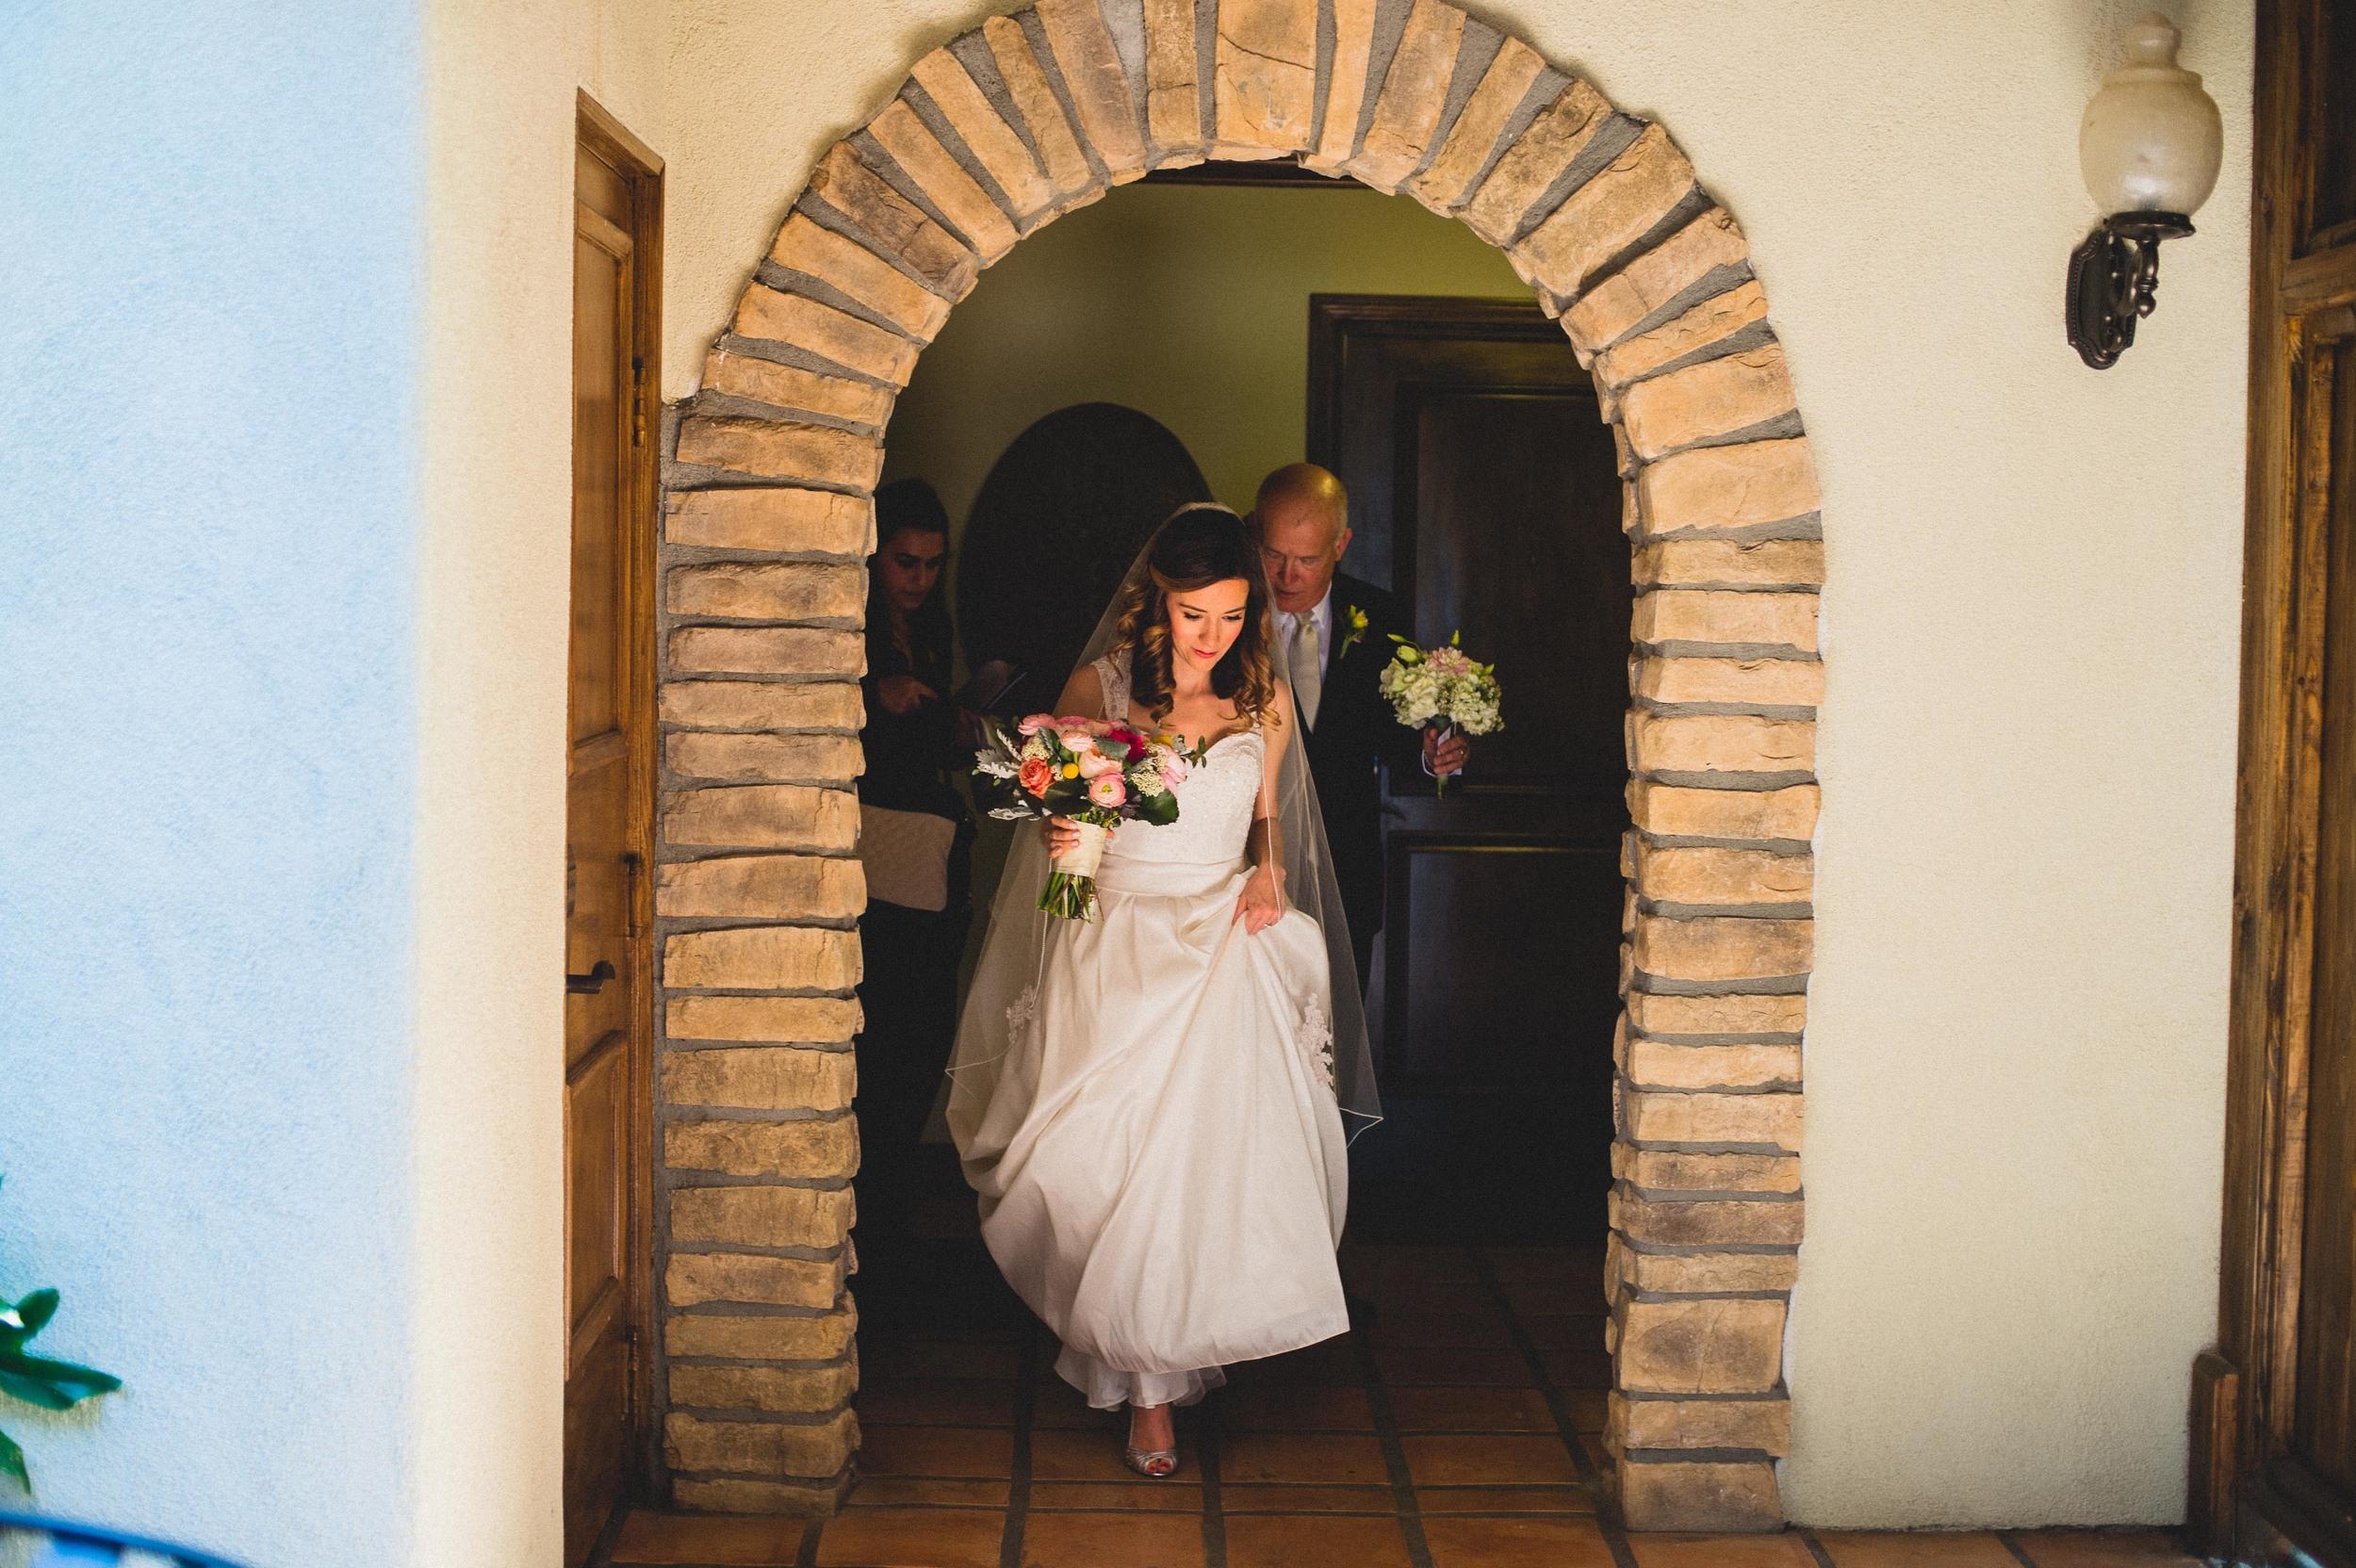 los angeles malibe cafe calamigos ranch wedding phtoographer edward lai-18.jpg